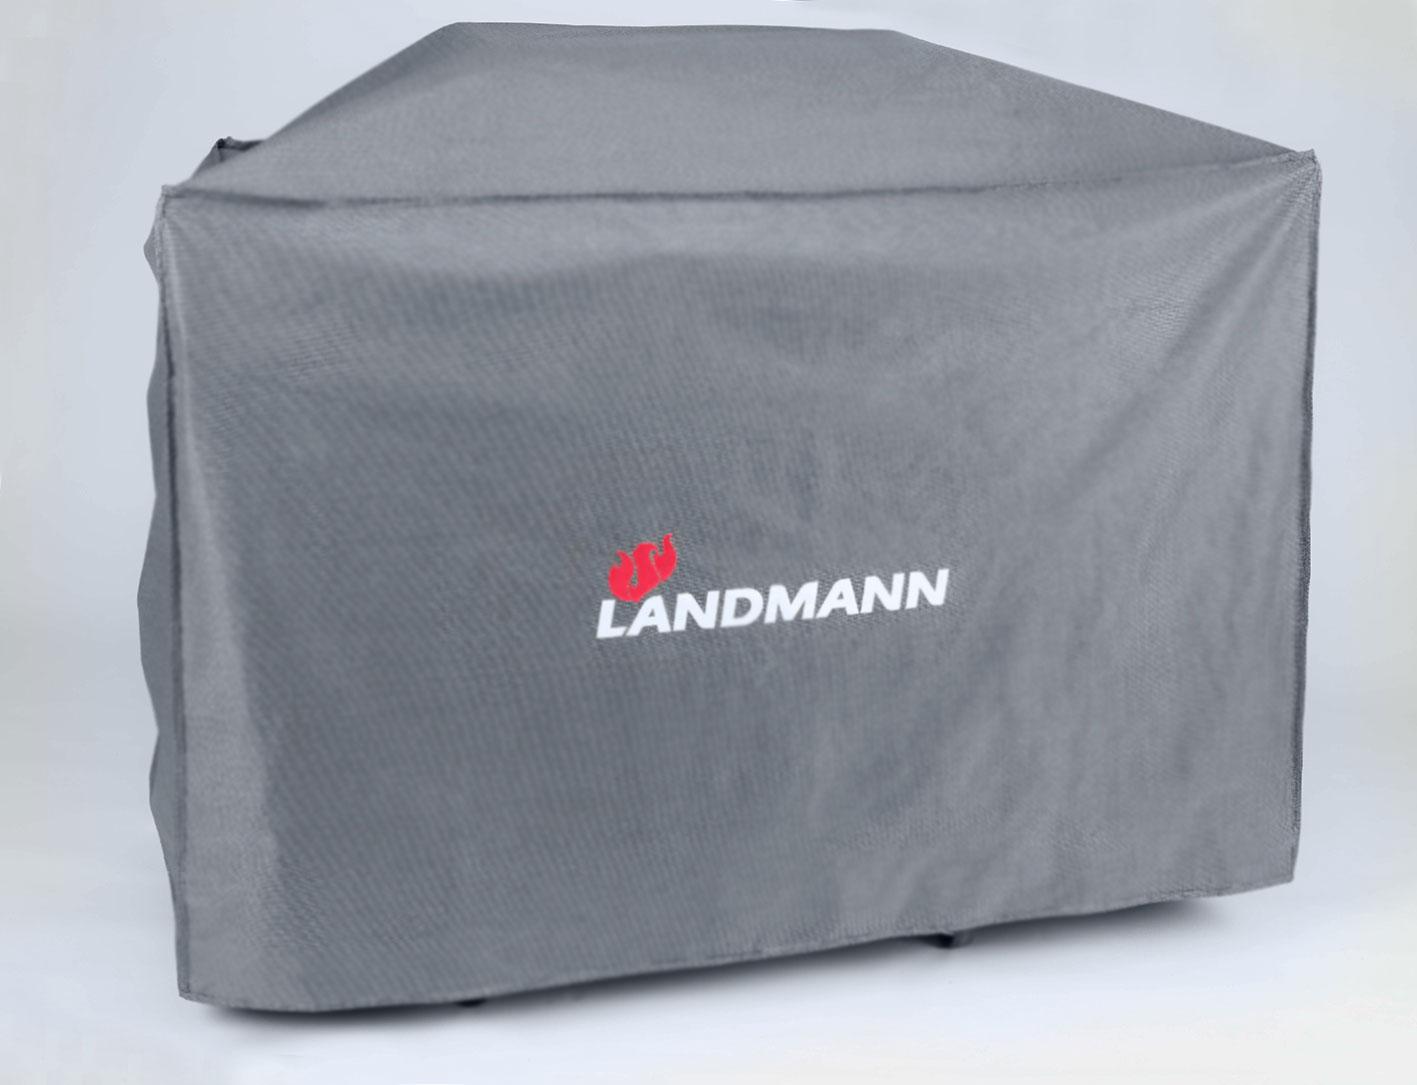 schutzh lle f r landmann grill wetterschutzhaube premium. Black Bedroom Furniture Sets. Home Design Ideas